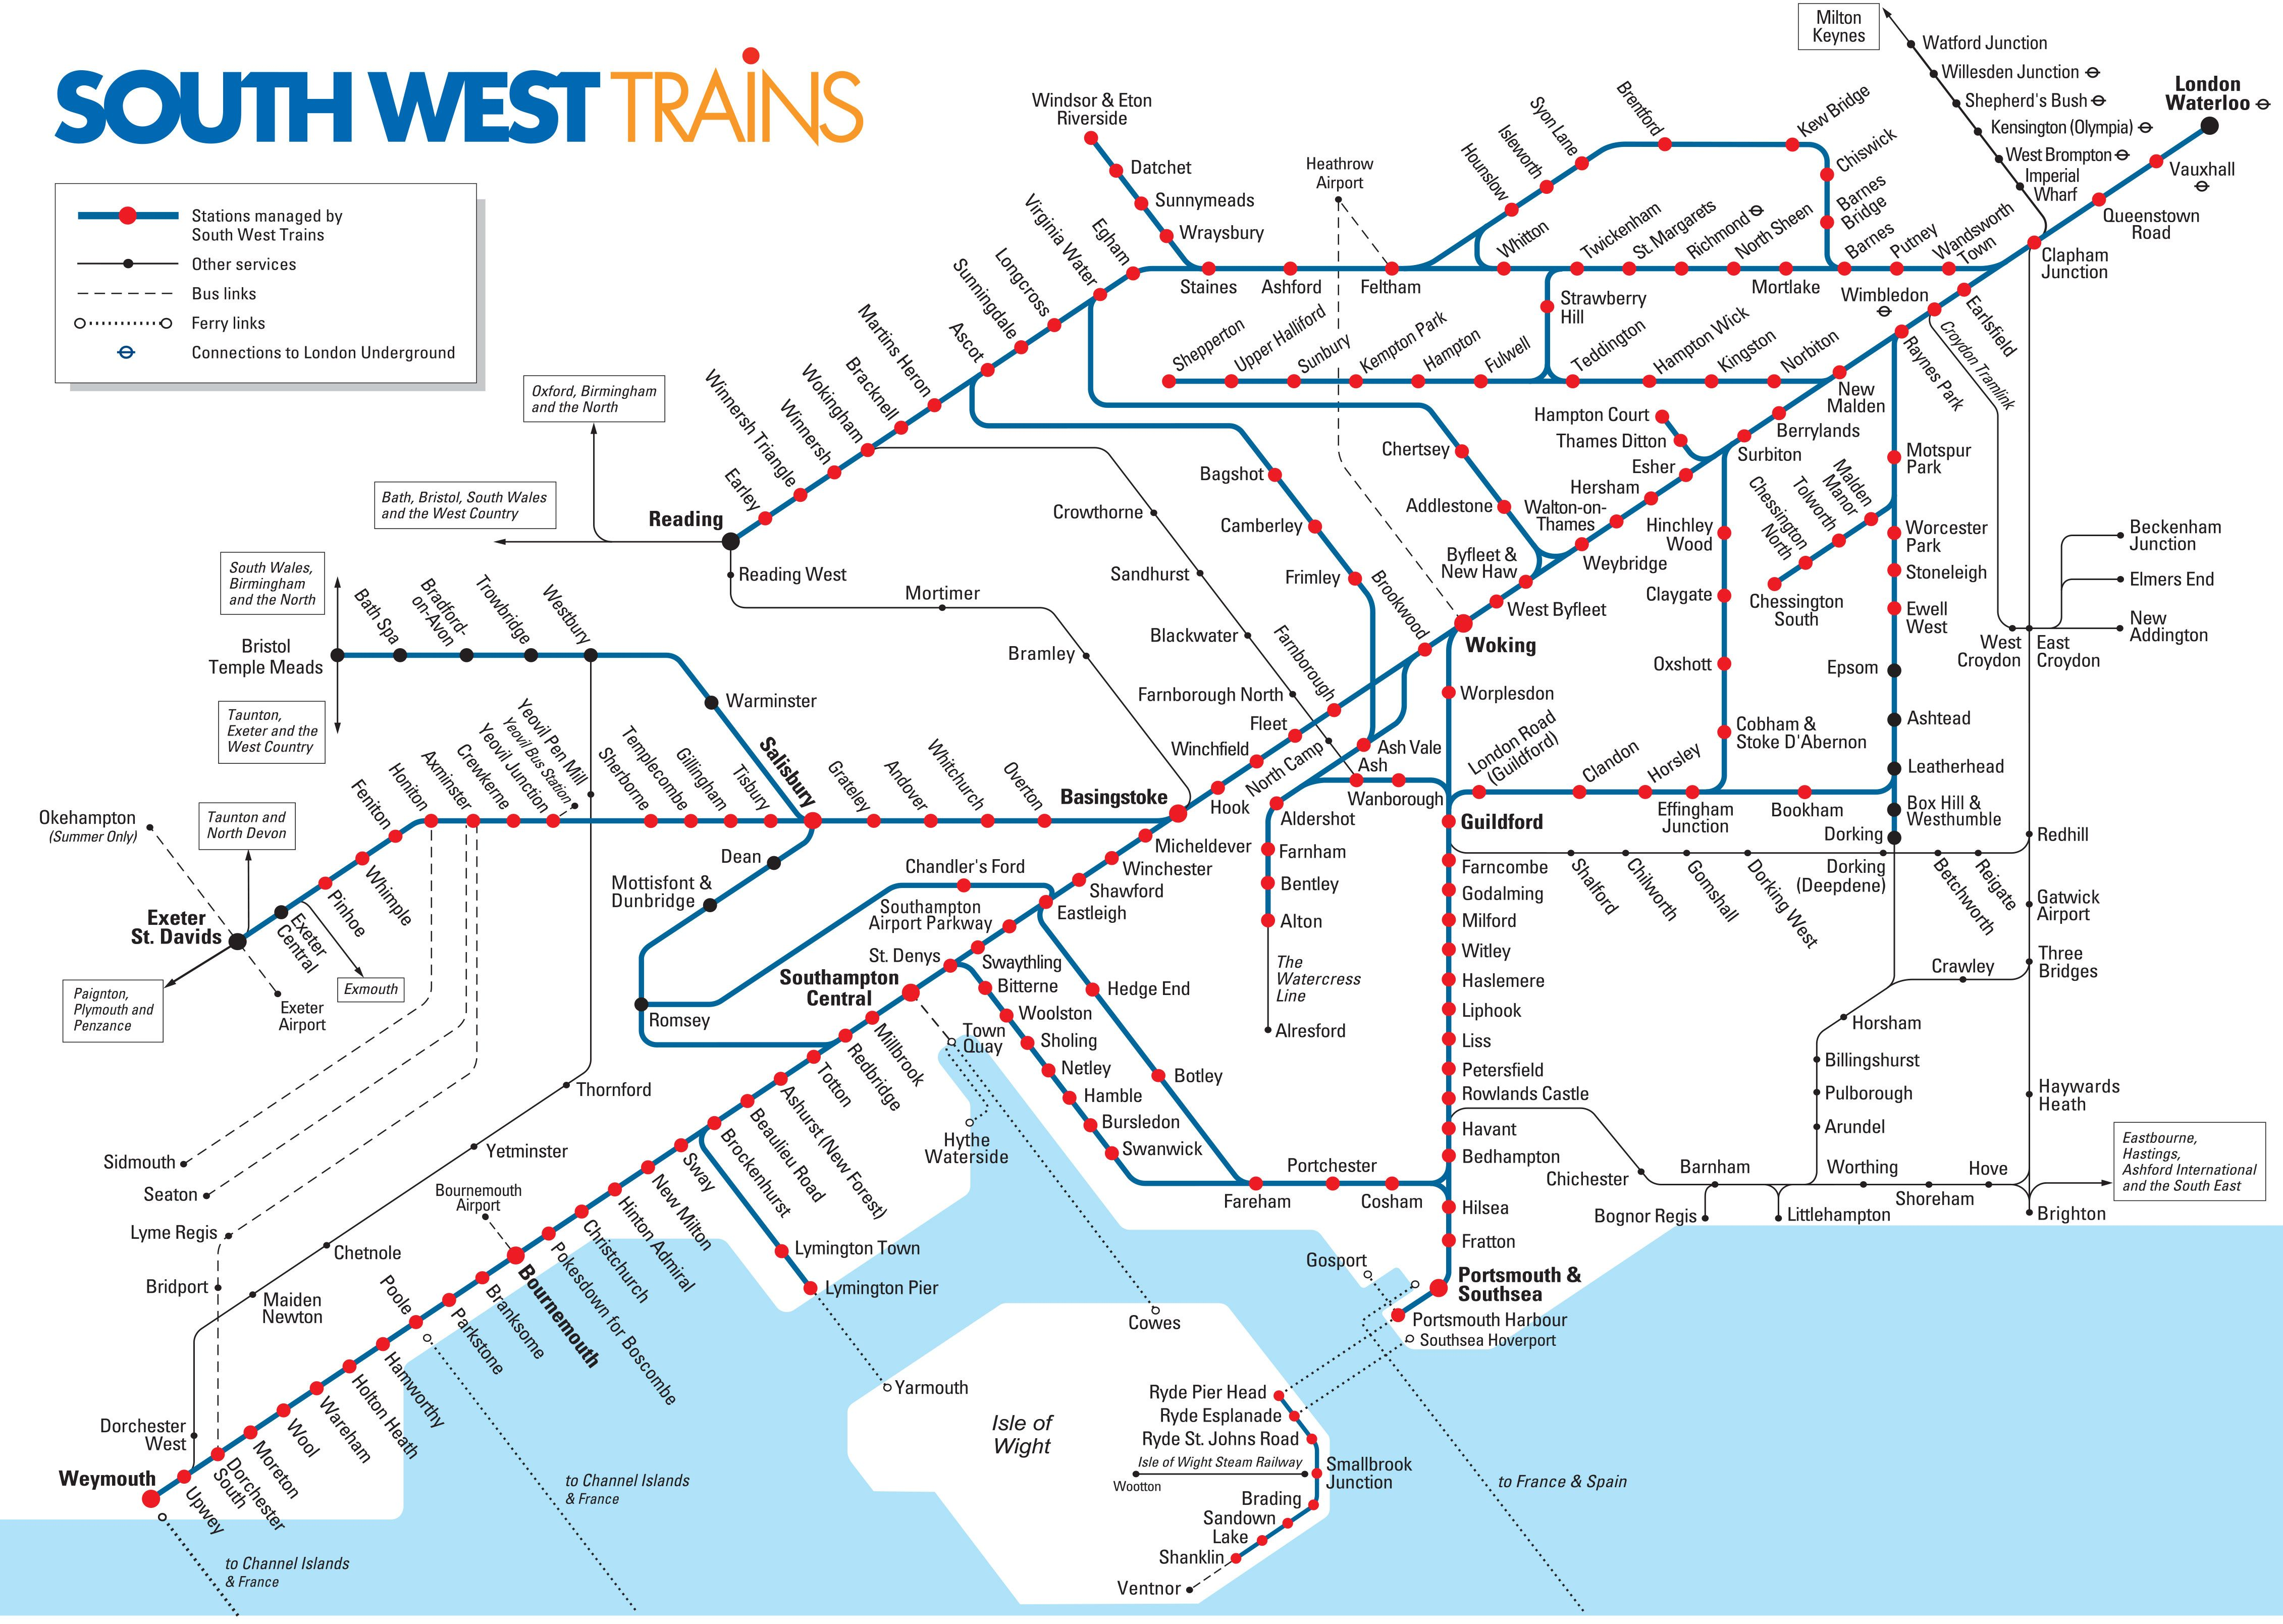 Map Of London South West Trains Rail Network Travel Pinterest - London map train